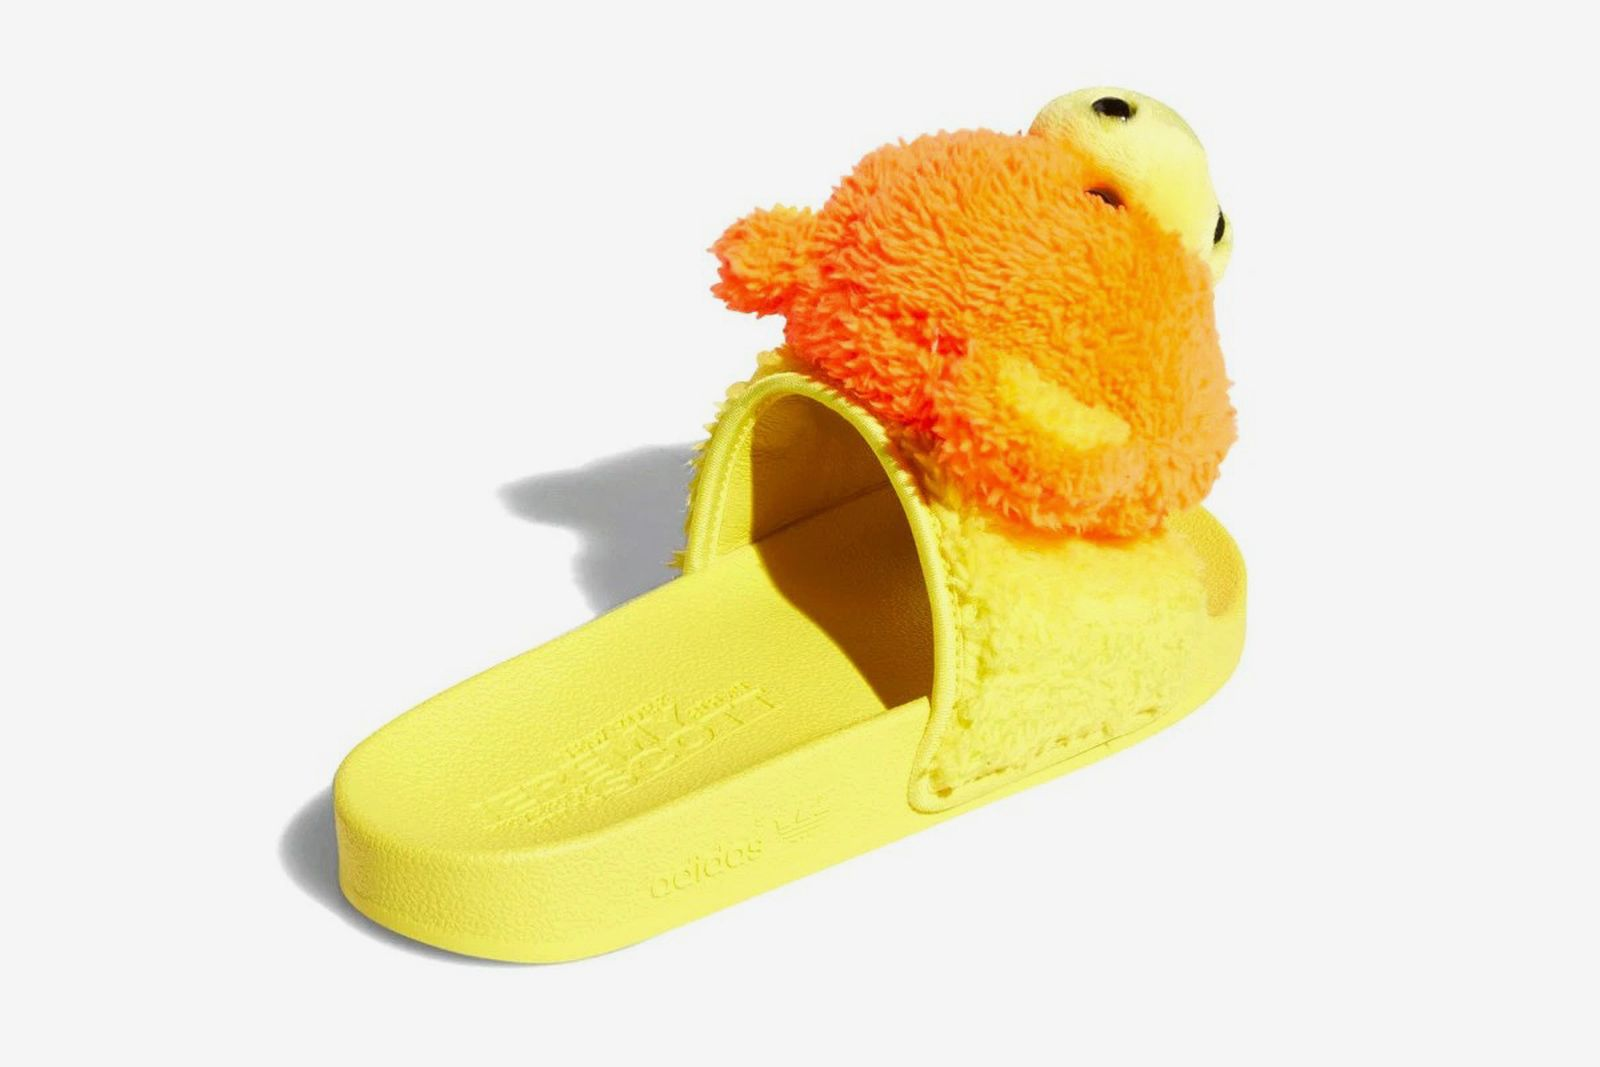 jeremy-scott-adidas-adilette-slides-js-bear-release-date-price-04